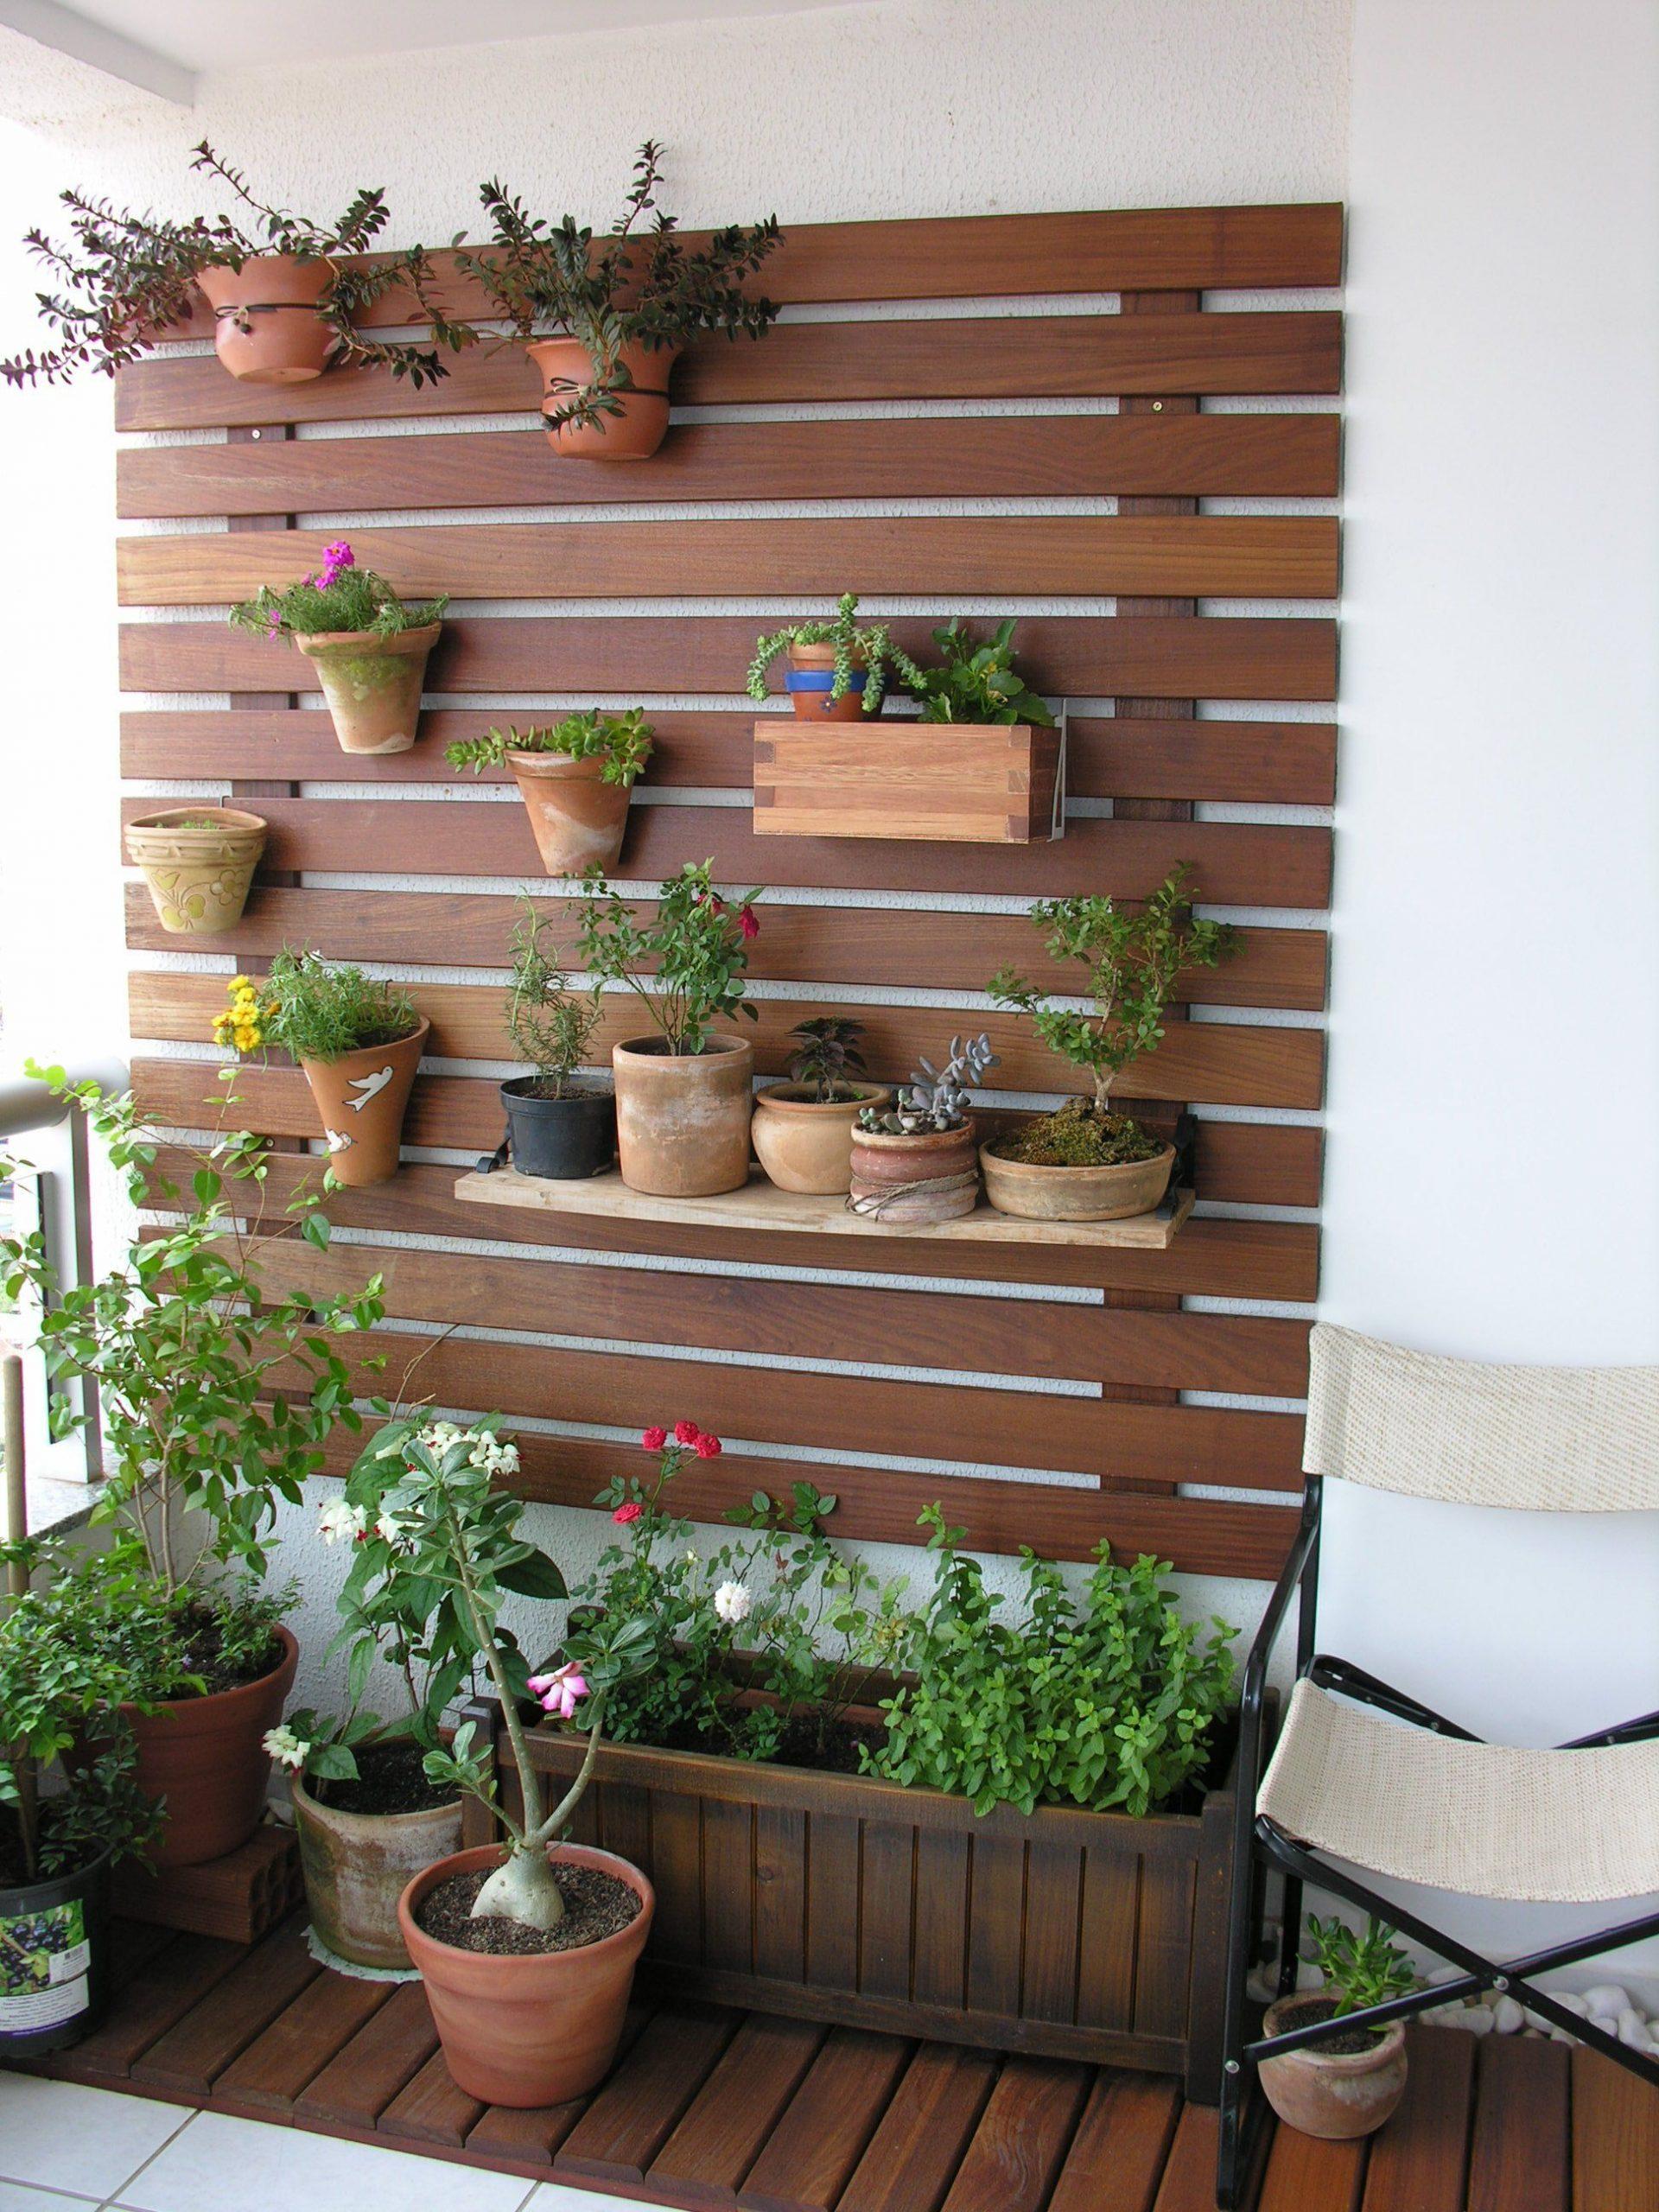 Pequena Varanda Com Um Jardim Vertical. | Patio Ideas ... dedans Maison Bebe Jardin